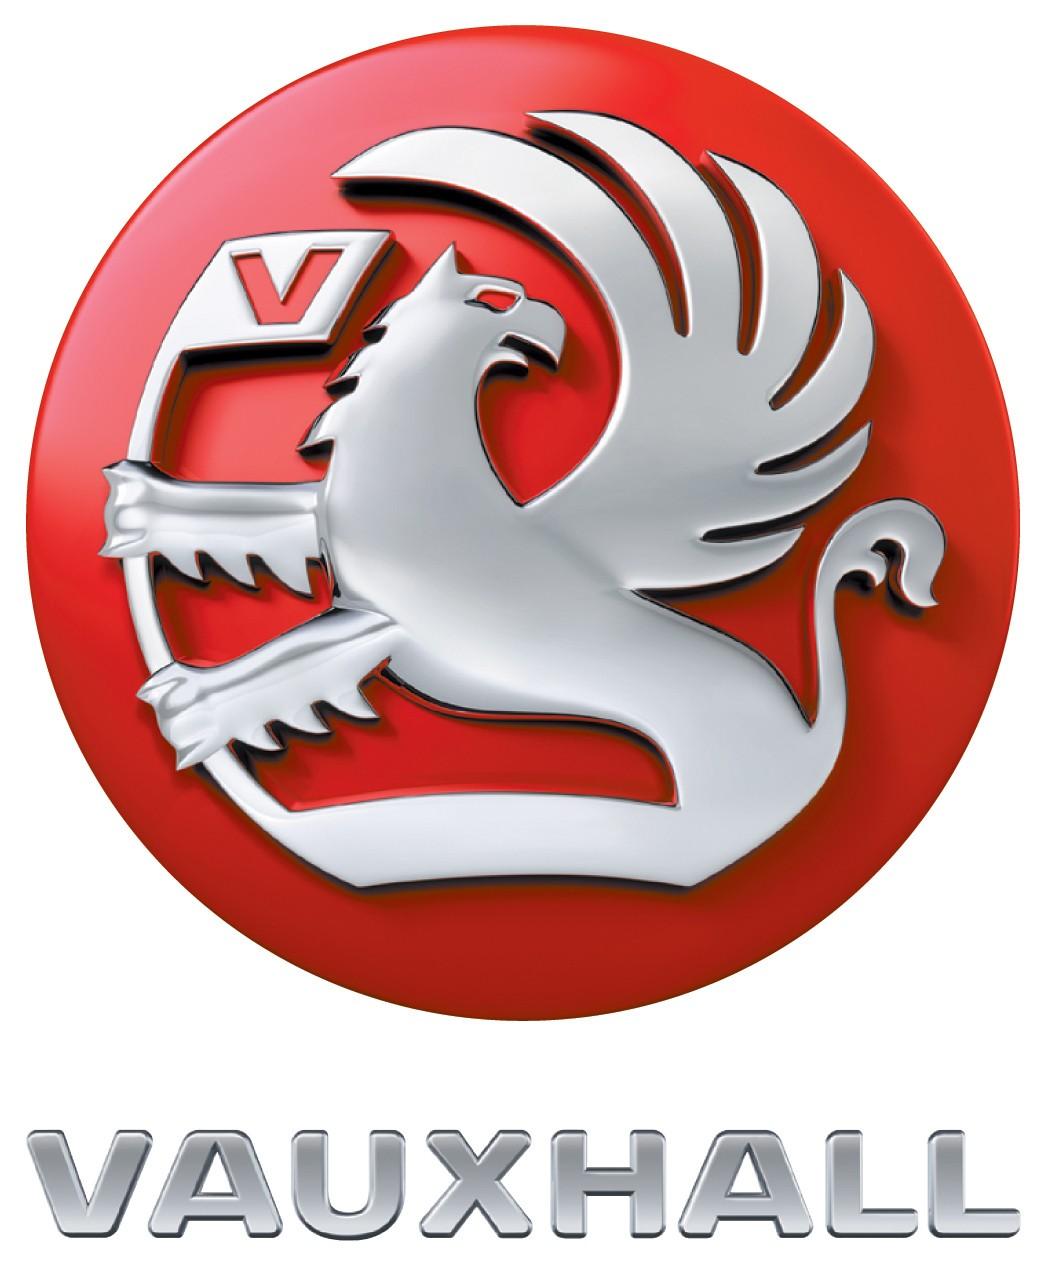 Vauxhall Logo Wallpaper